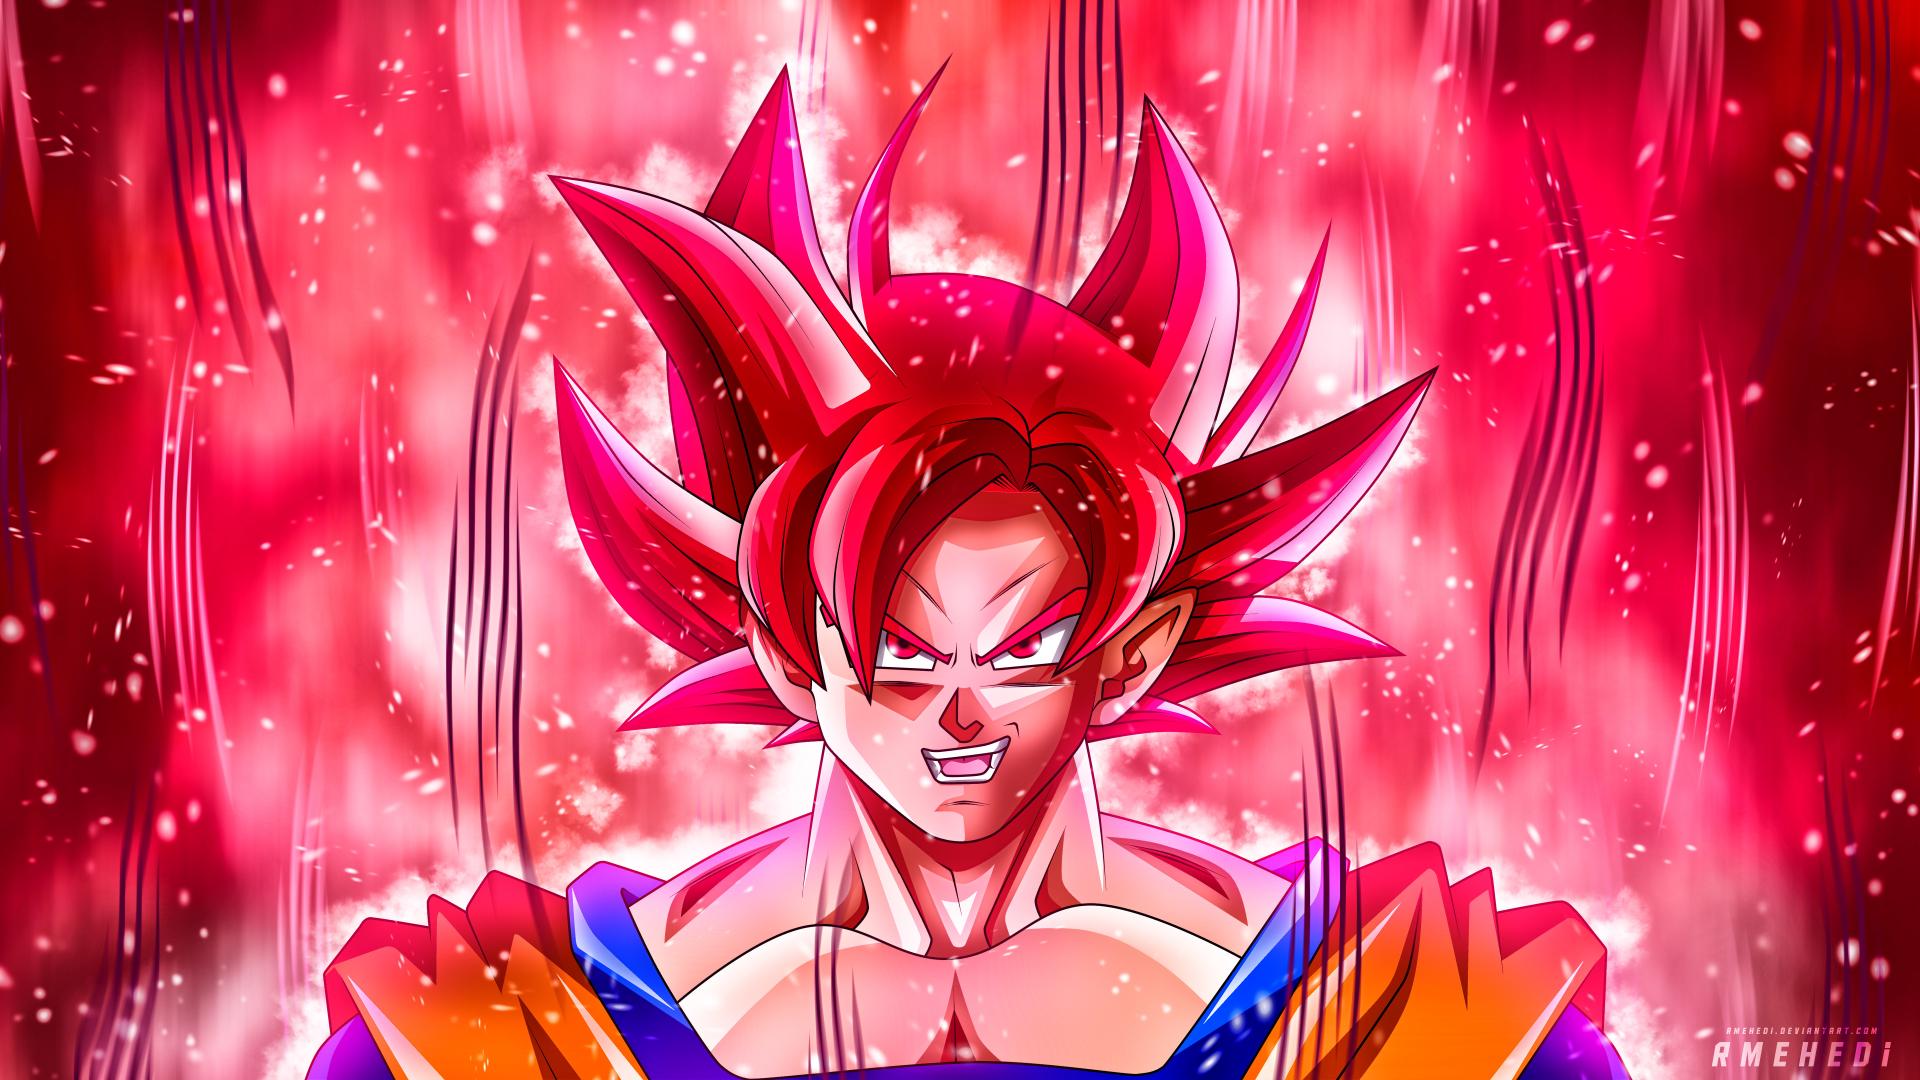 1920x1080 Goku Anime 1080p Laptop Full Hd Wallpaper Hd Anime 4k